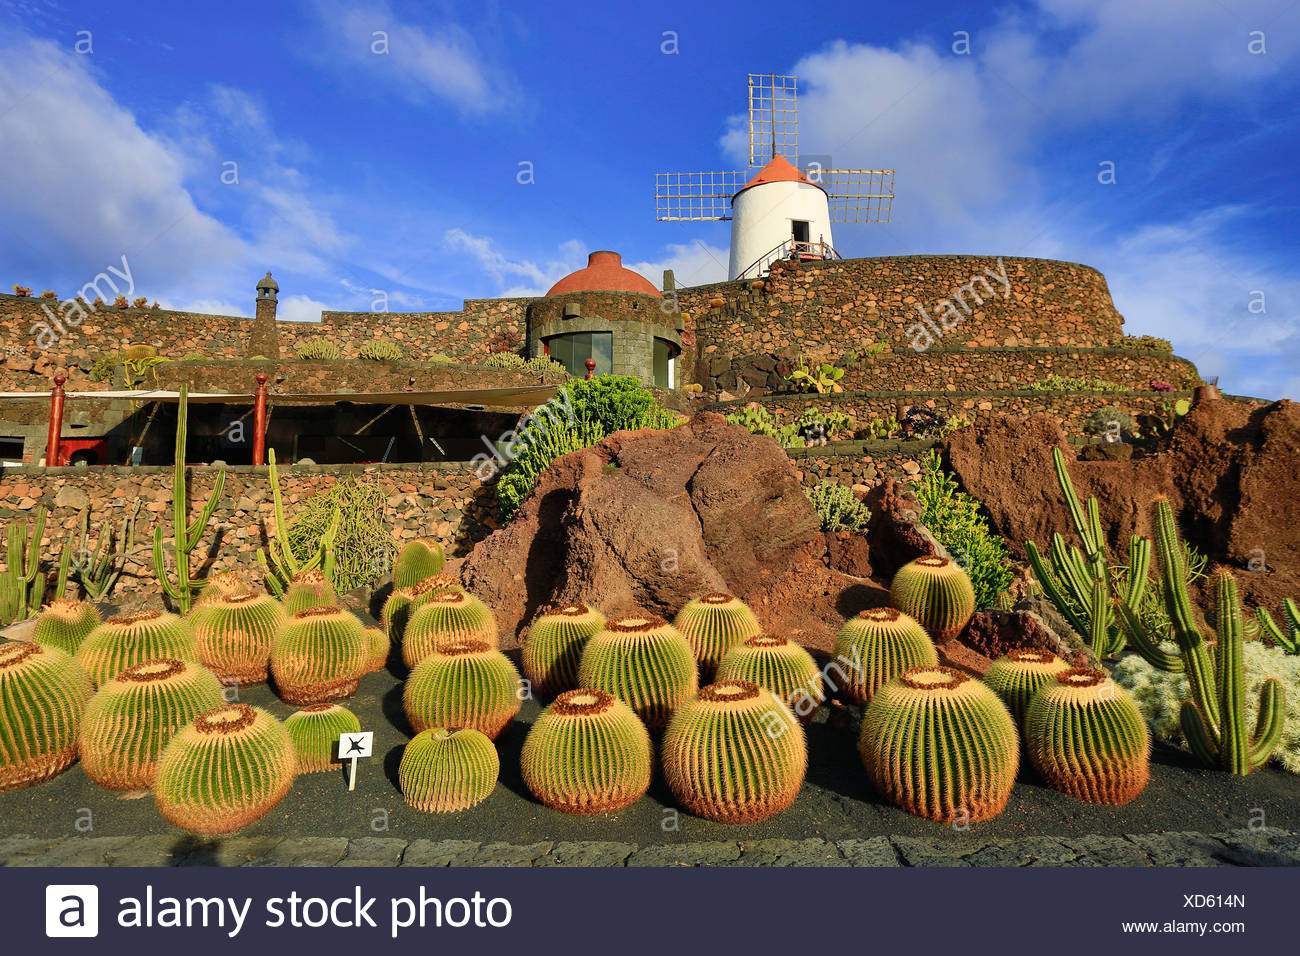 Spain, Europe, Canary Islands, Guatiza, Lanzarote, cactus, plants, garden, island, sunset, wind mill - Stock Image